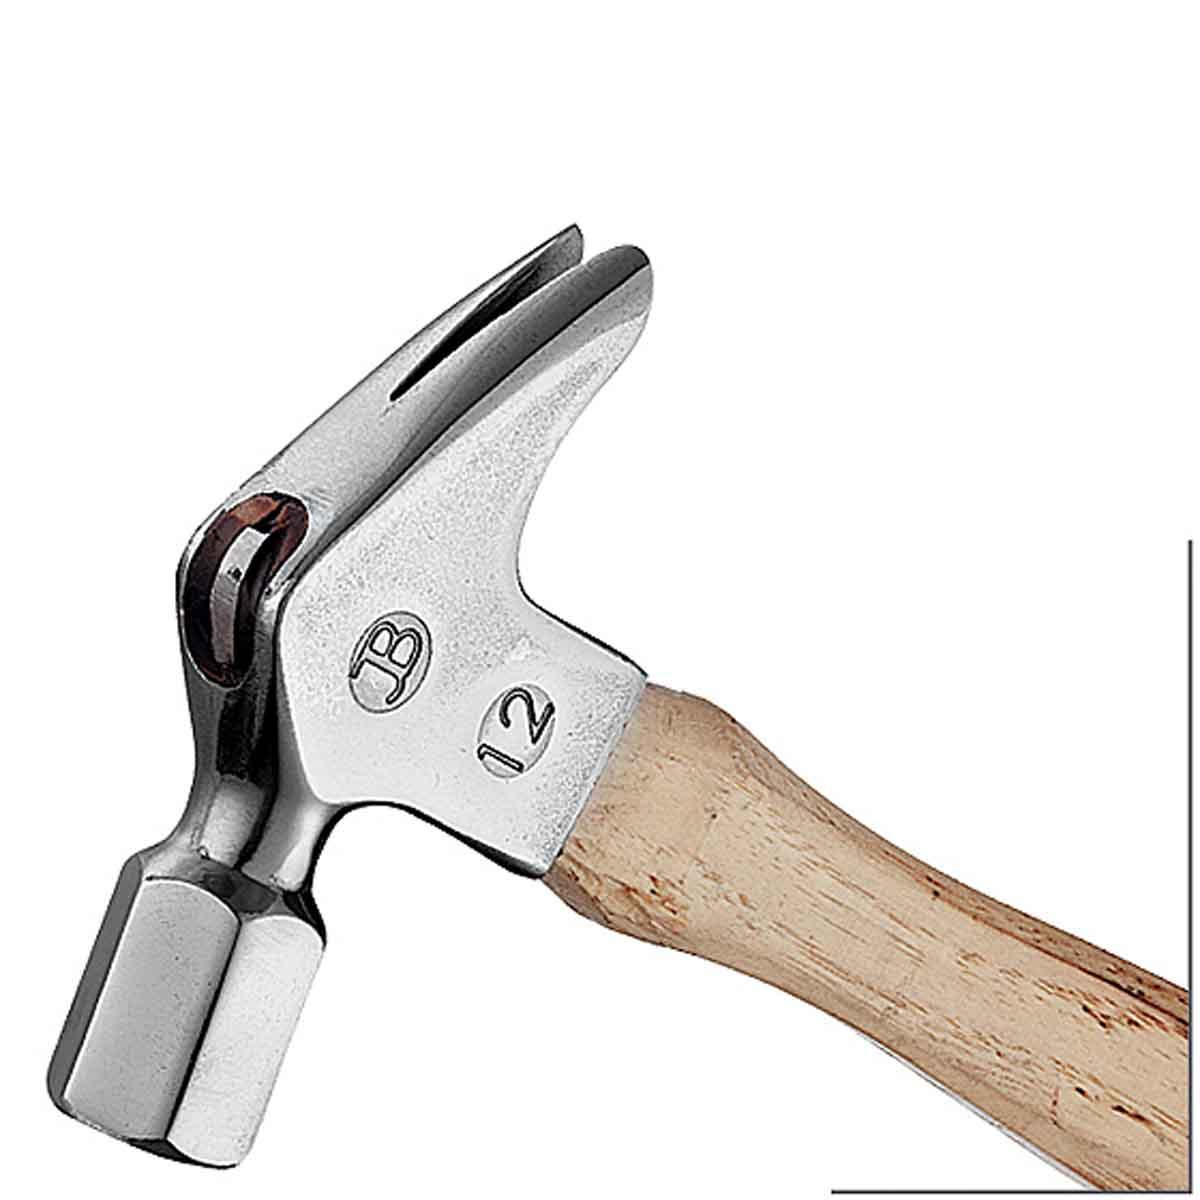 Jim Blurton Nailing Hammers